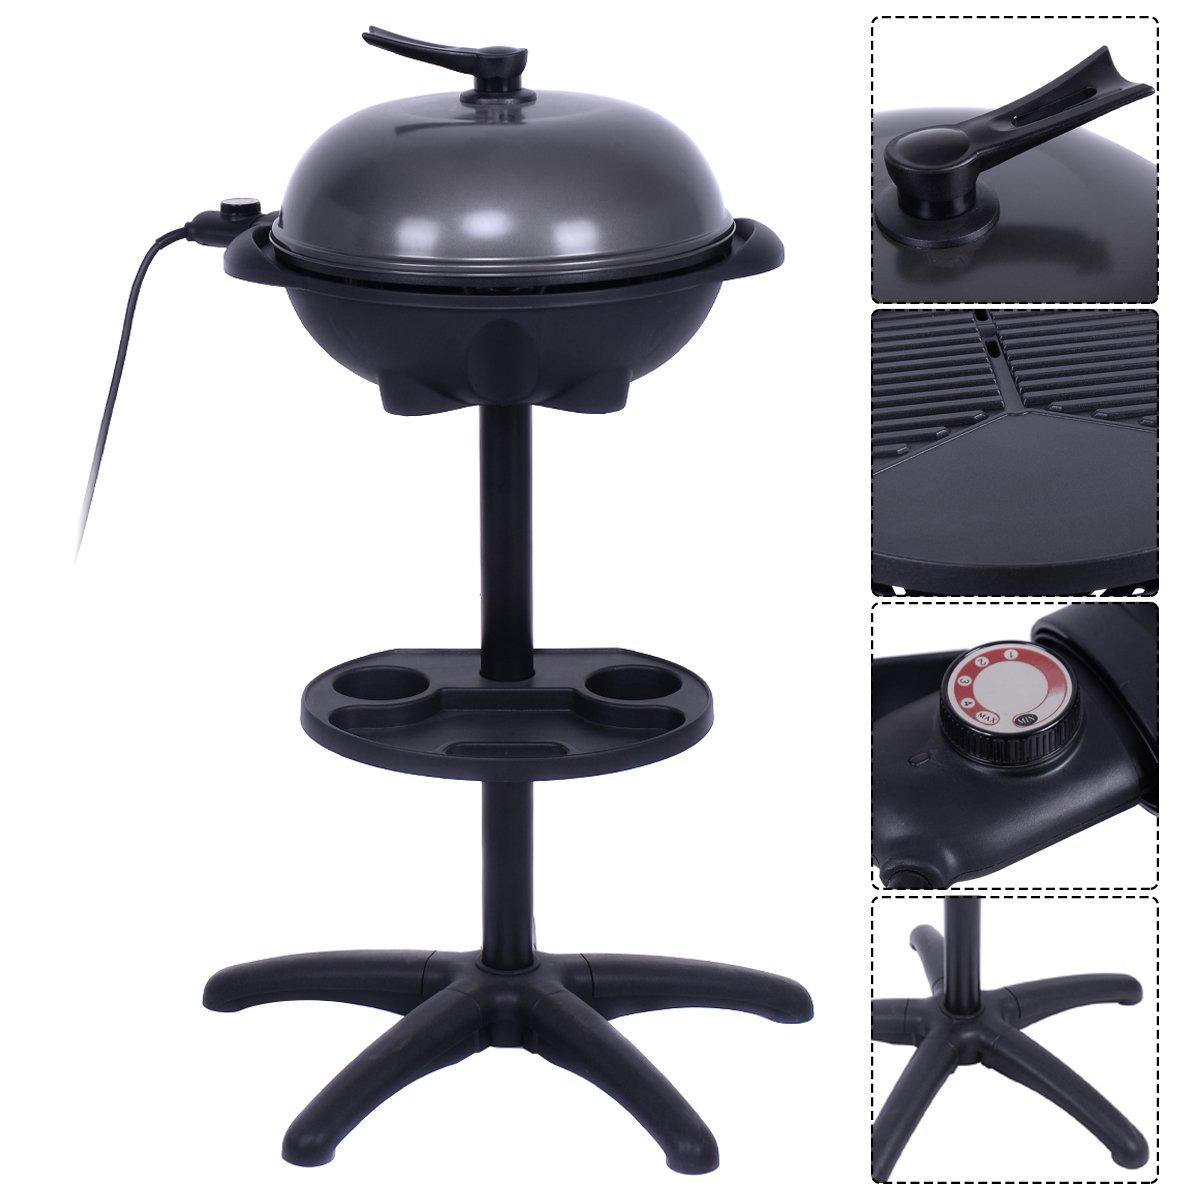 COSTWAY 1350W Indoor/Outdoor Electric BBQ Grill, Black by COSTWAY (Image #2)